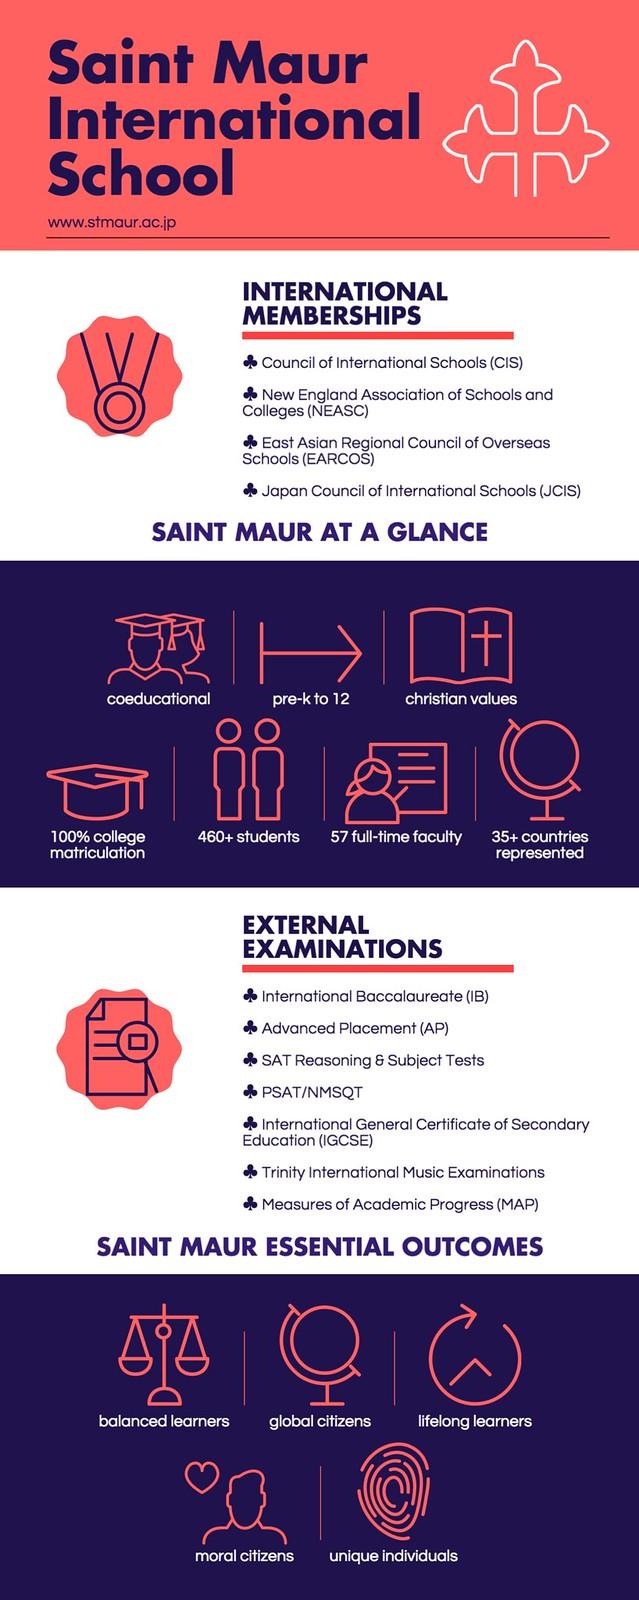 saint-maur-international-school